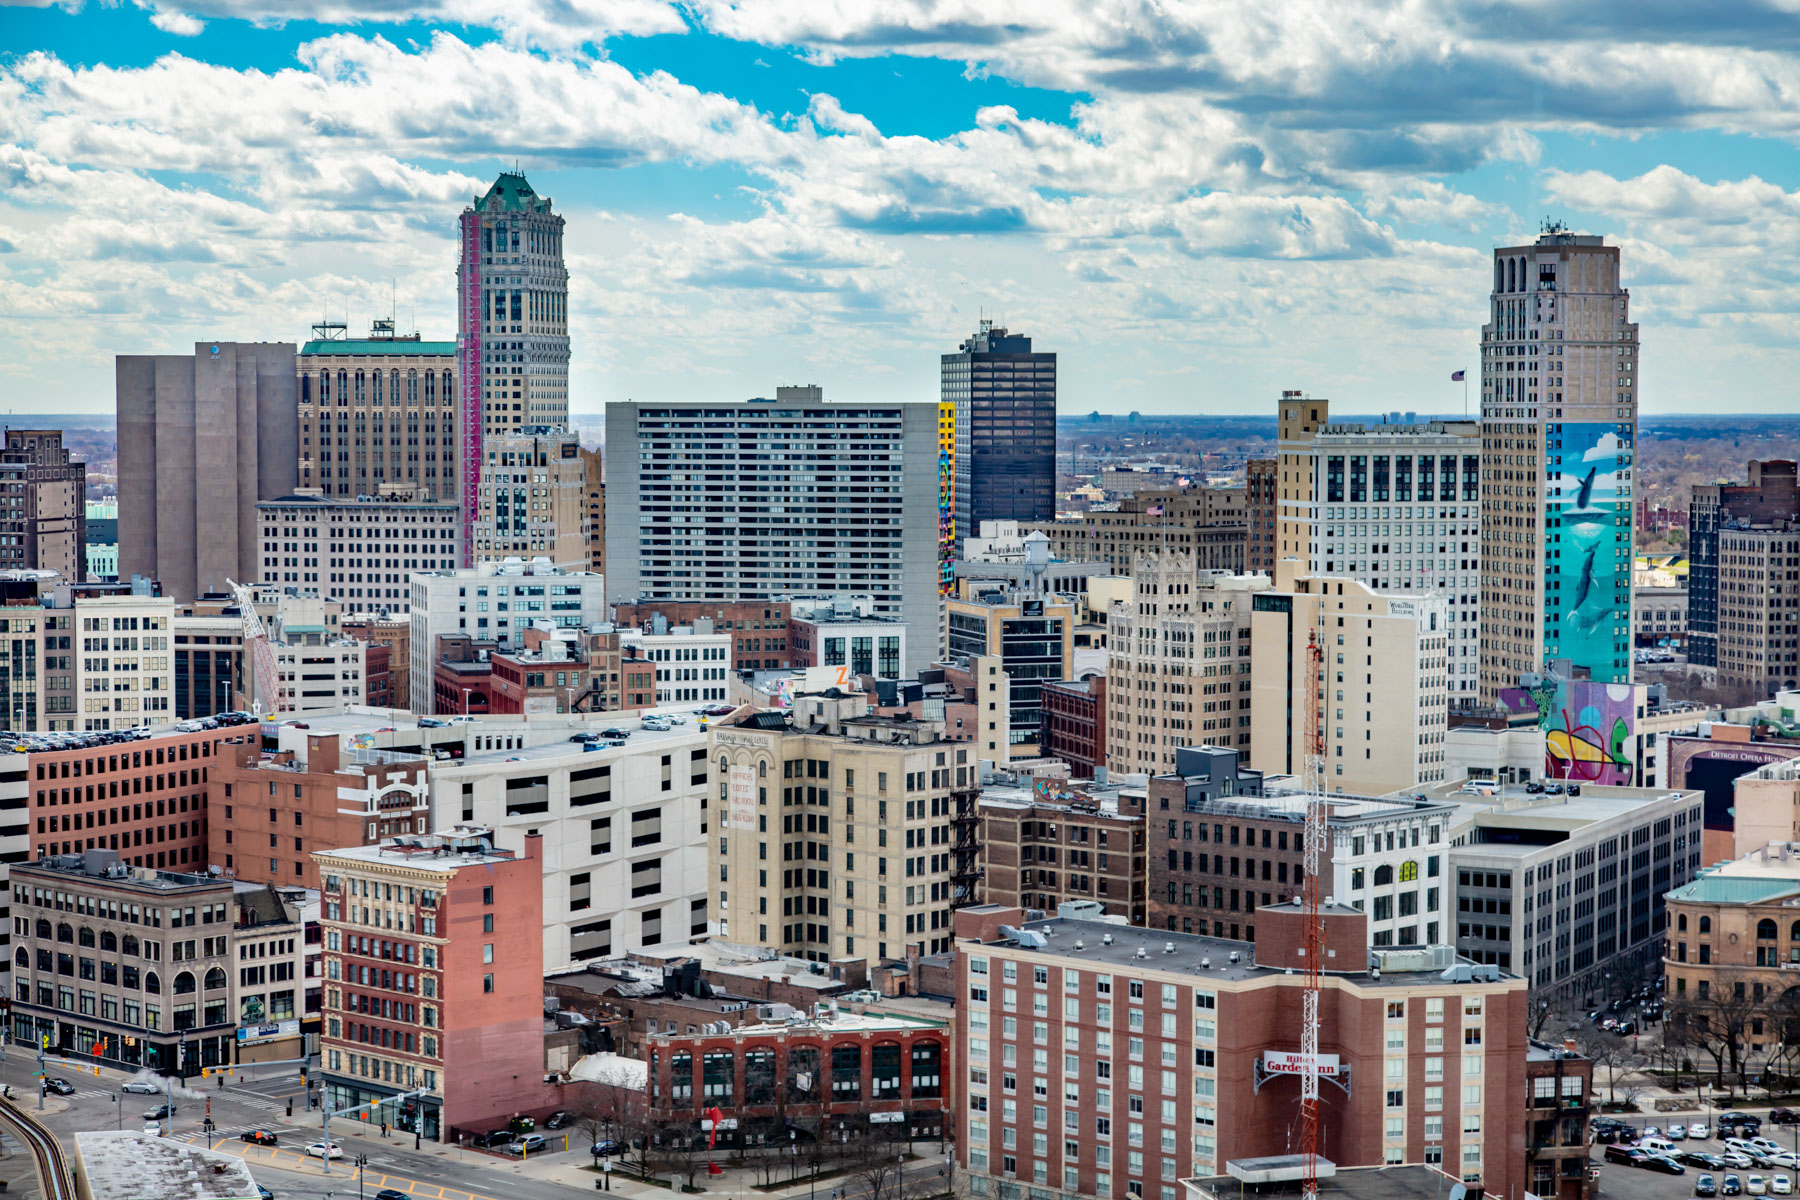 City pics GtCH Rooftop - 1z3a7257